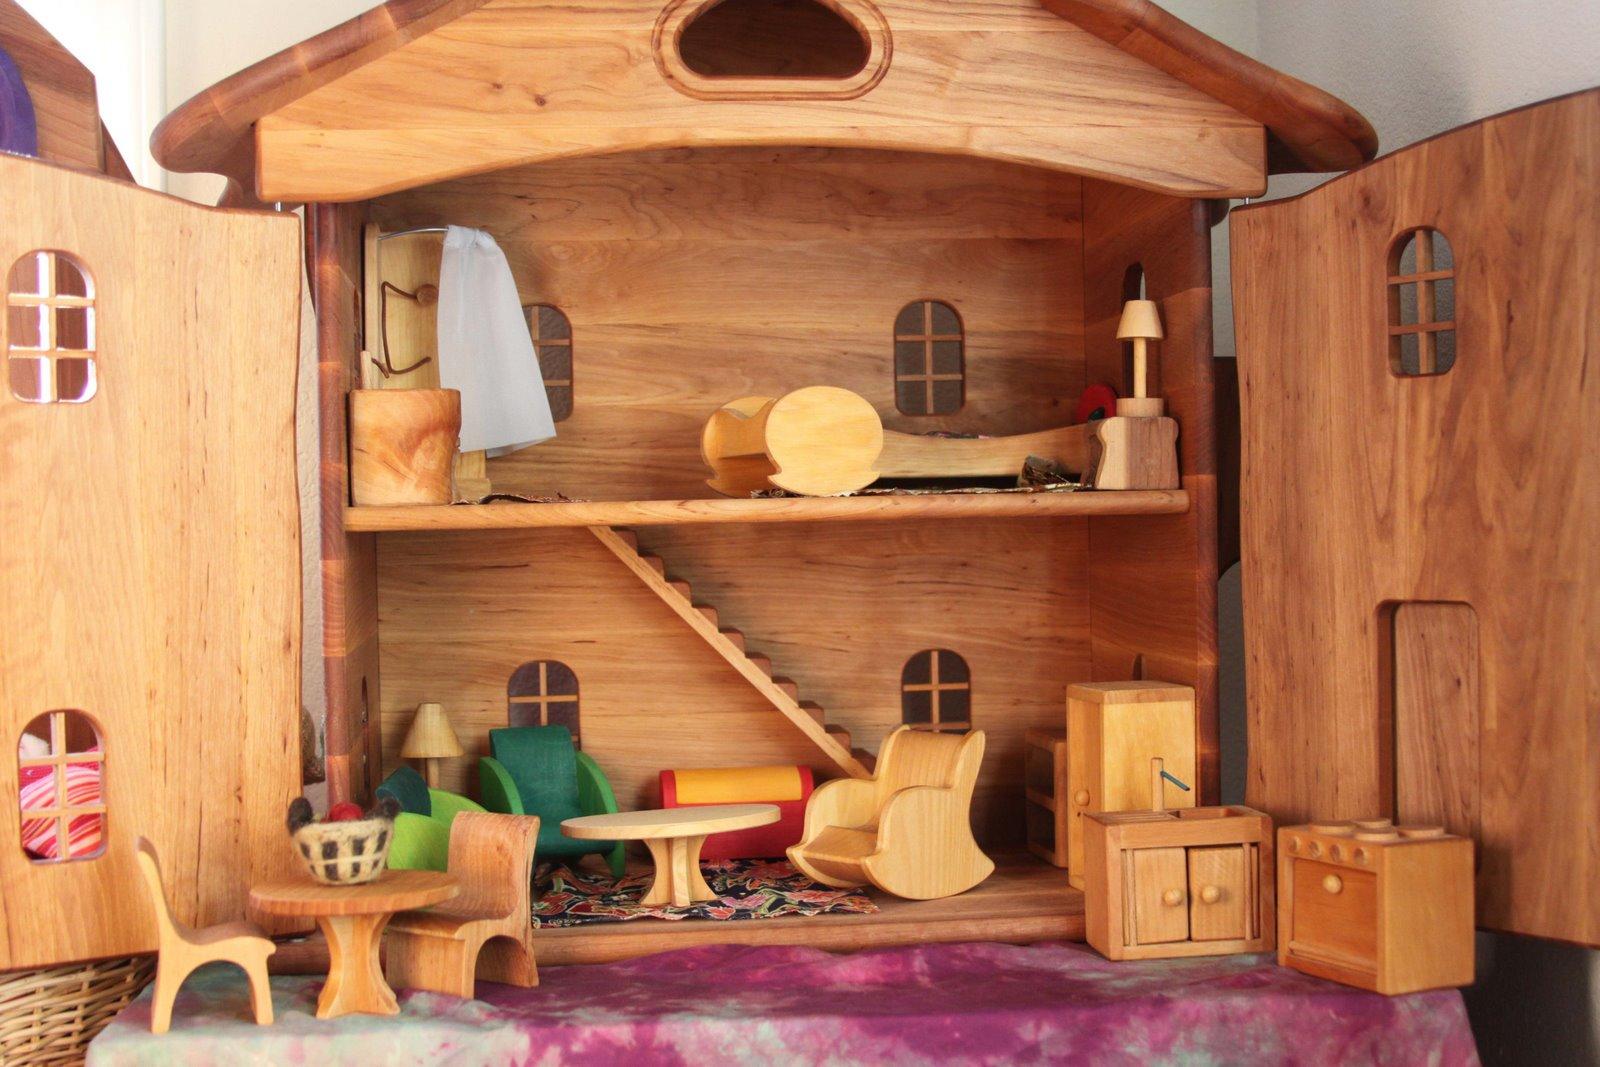 building doll furniture. 00062a.jpg. I Believe Her Dollhouse Furniture Building Doll